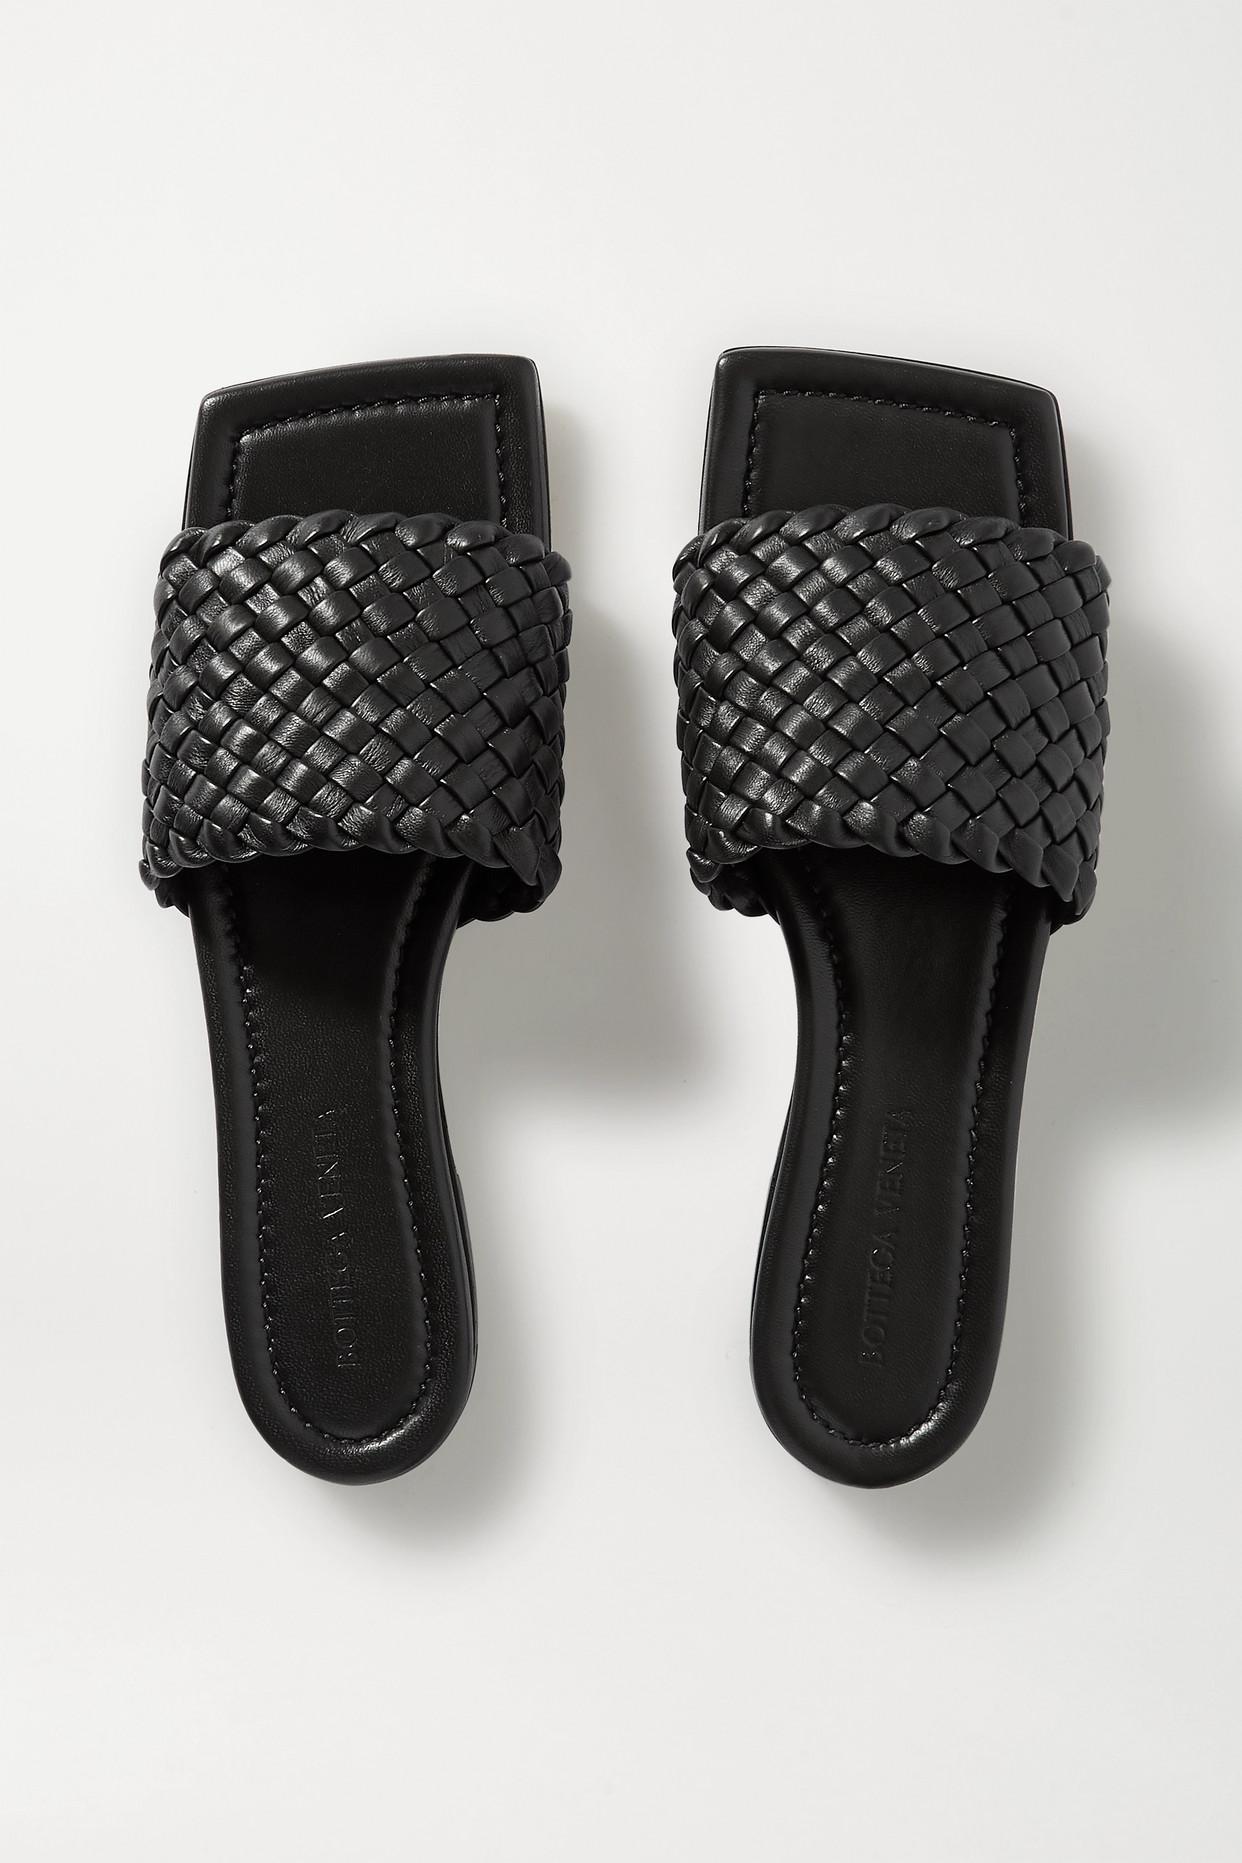 BOTTEGA VENETA - Intrecciato Leather Slides - Black - IT36